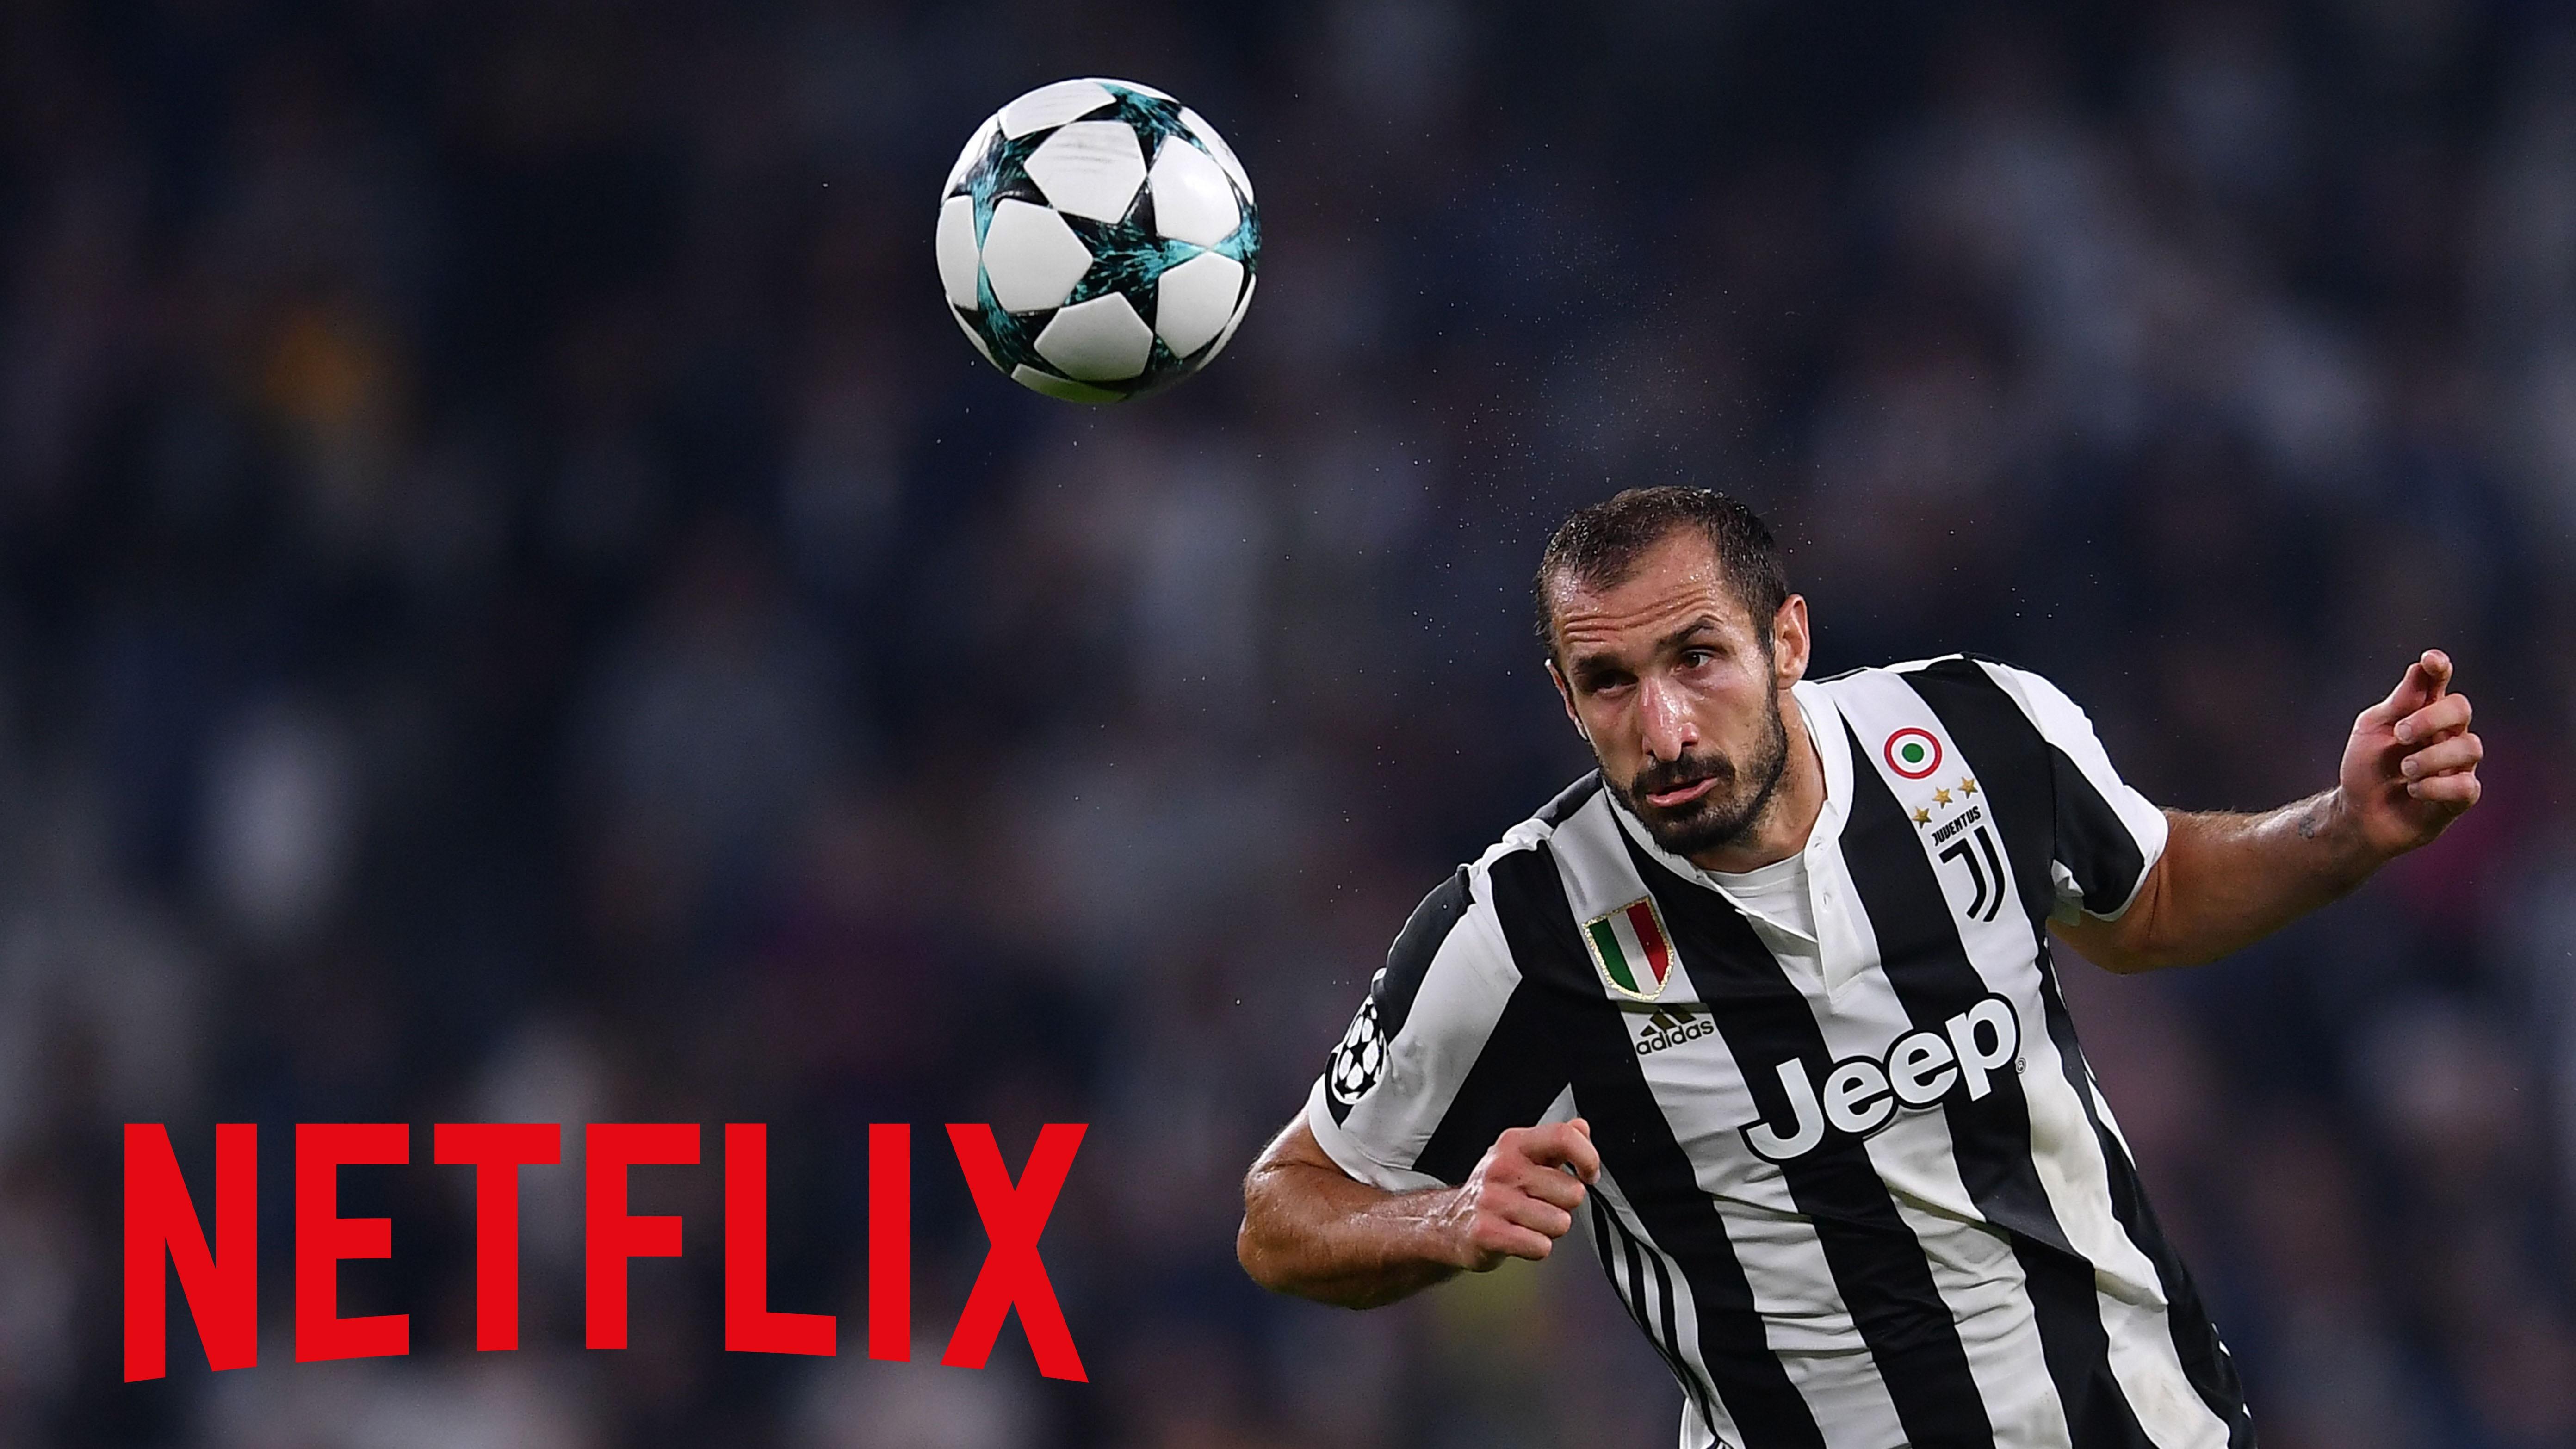 Chiellini Juventus Netflix